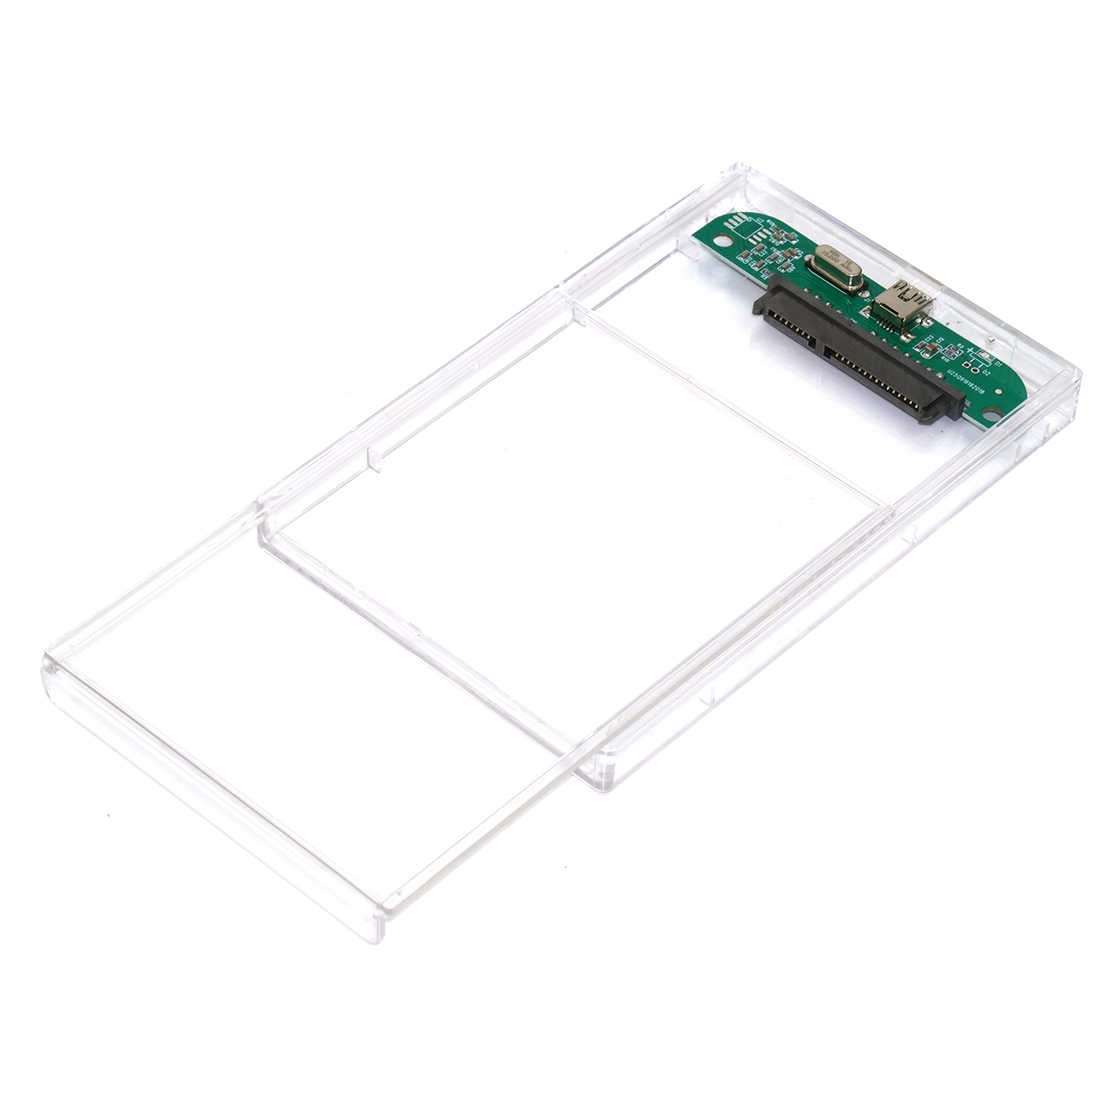 XT-XINTE HDD Case 2.5 بوصة 5Gbps USB 3.0 2.0 إلى SATA أداة مجانية قرص صلب خارجي الضميمة صندوق دعم 3 تيرا بايت UASP بروتوكول